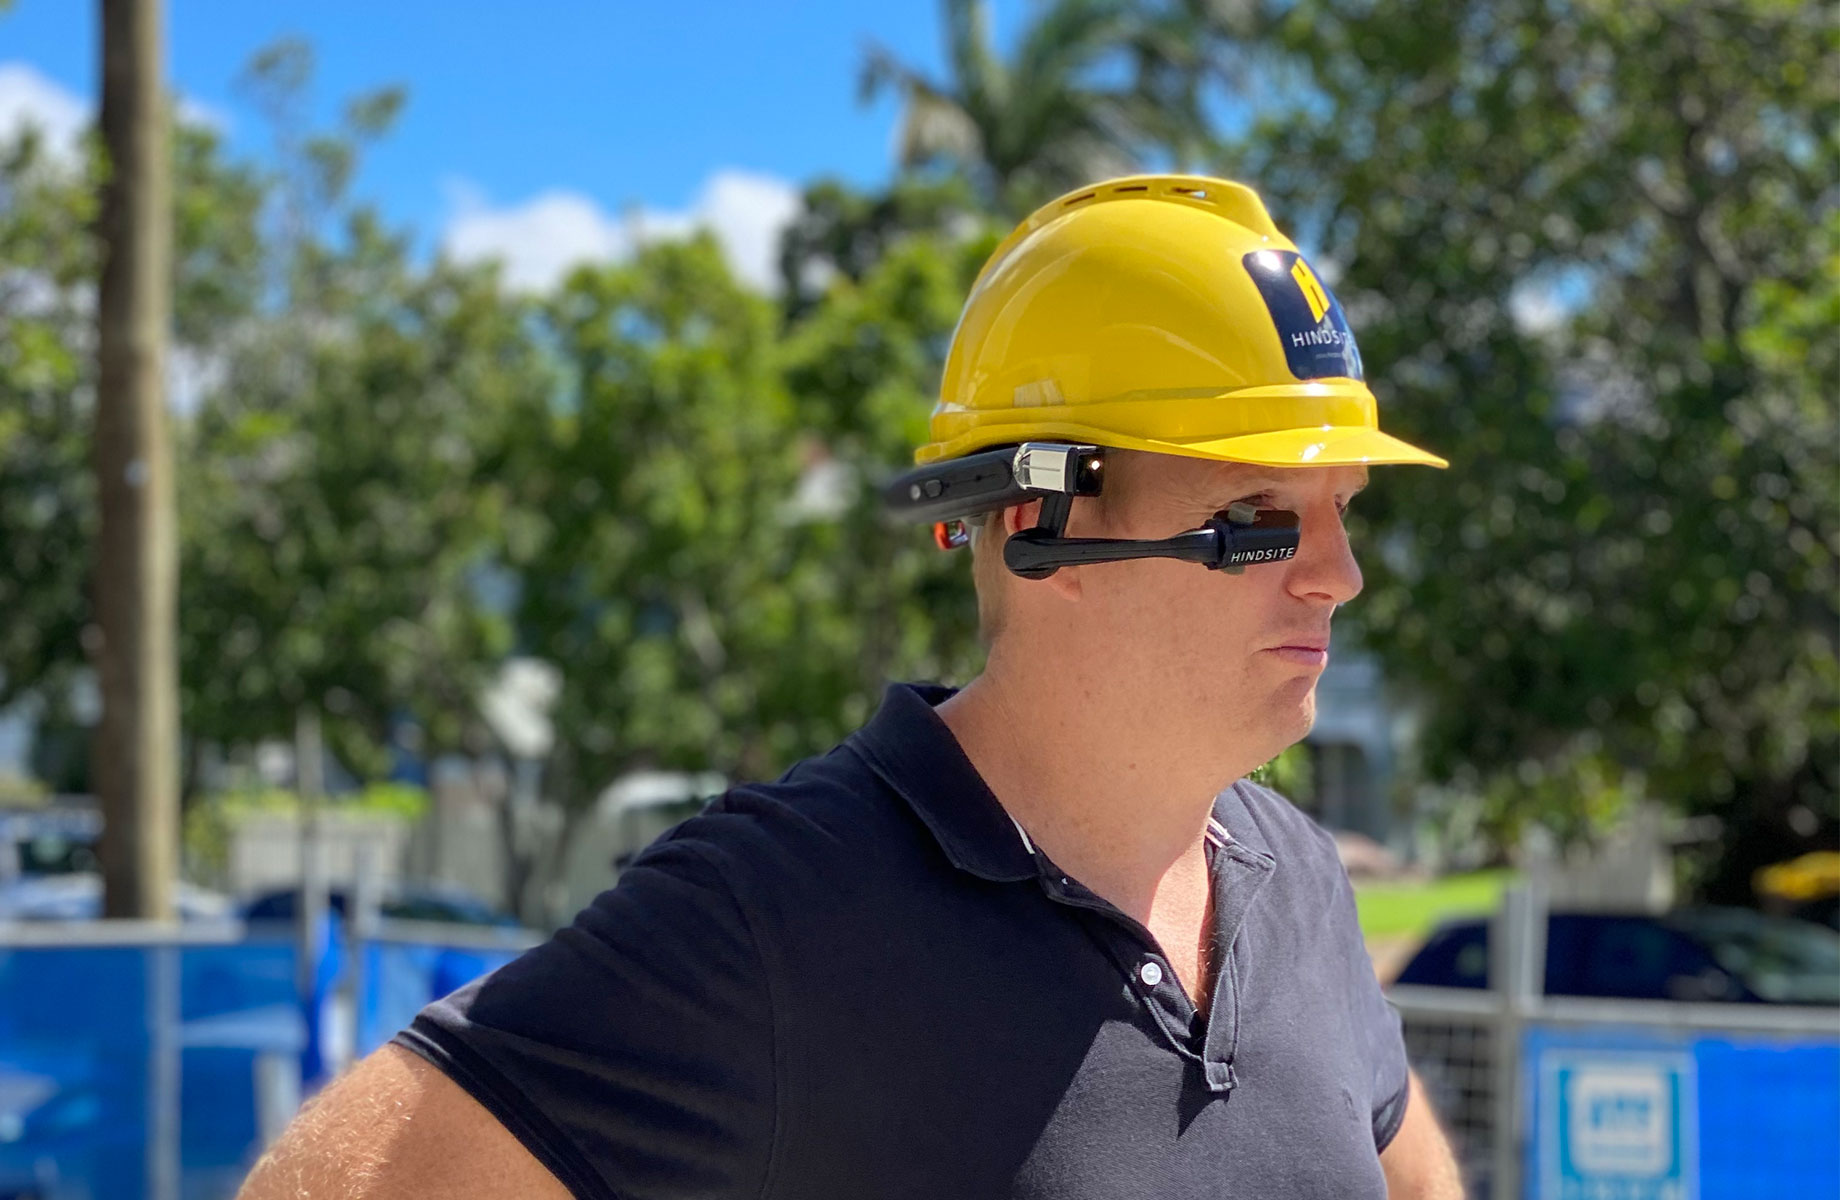 Hindsite Google Glass RealWear Wearable Technology Brisbane